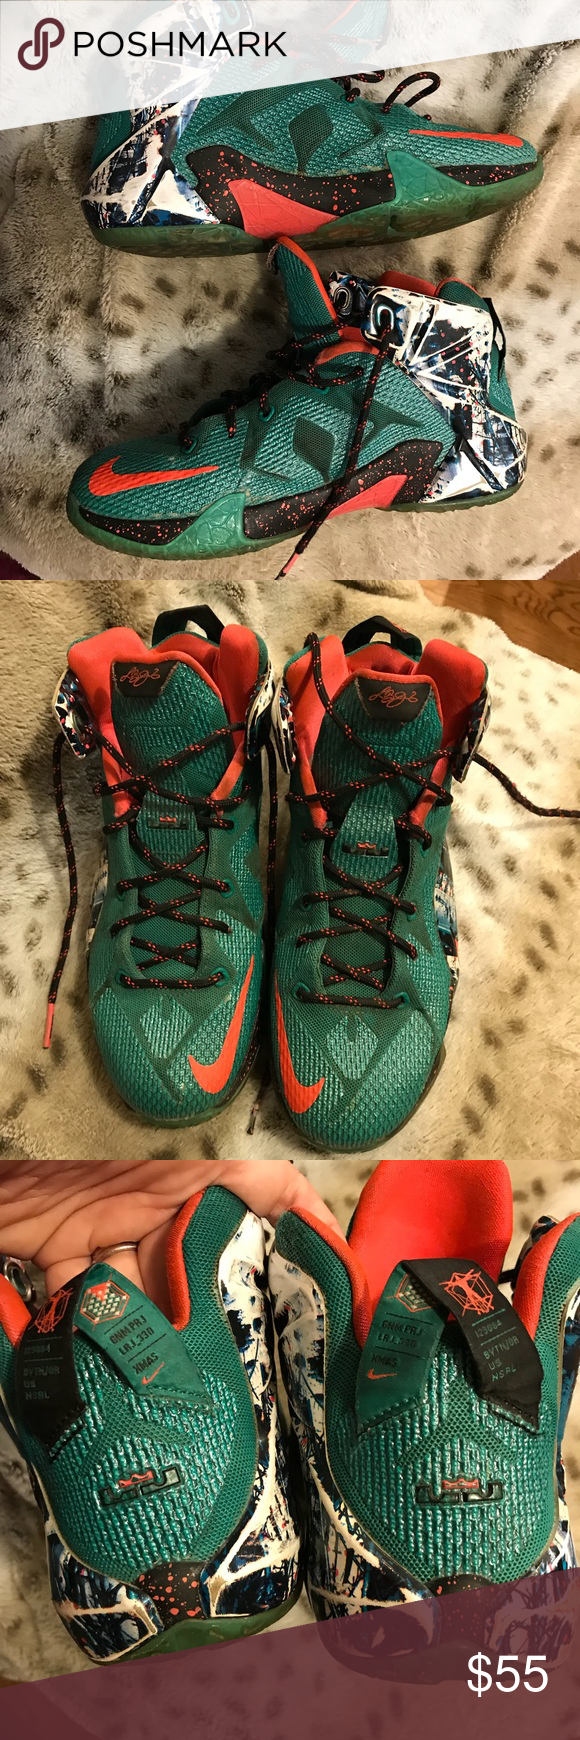 "Nike LeBron 12 Christmas sneakers ""Akron Birch"" | My Posh Closet ..."